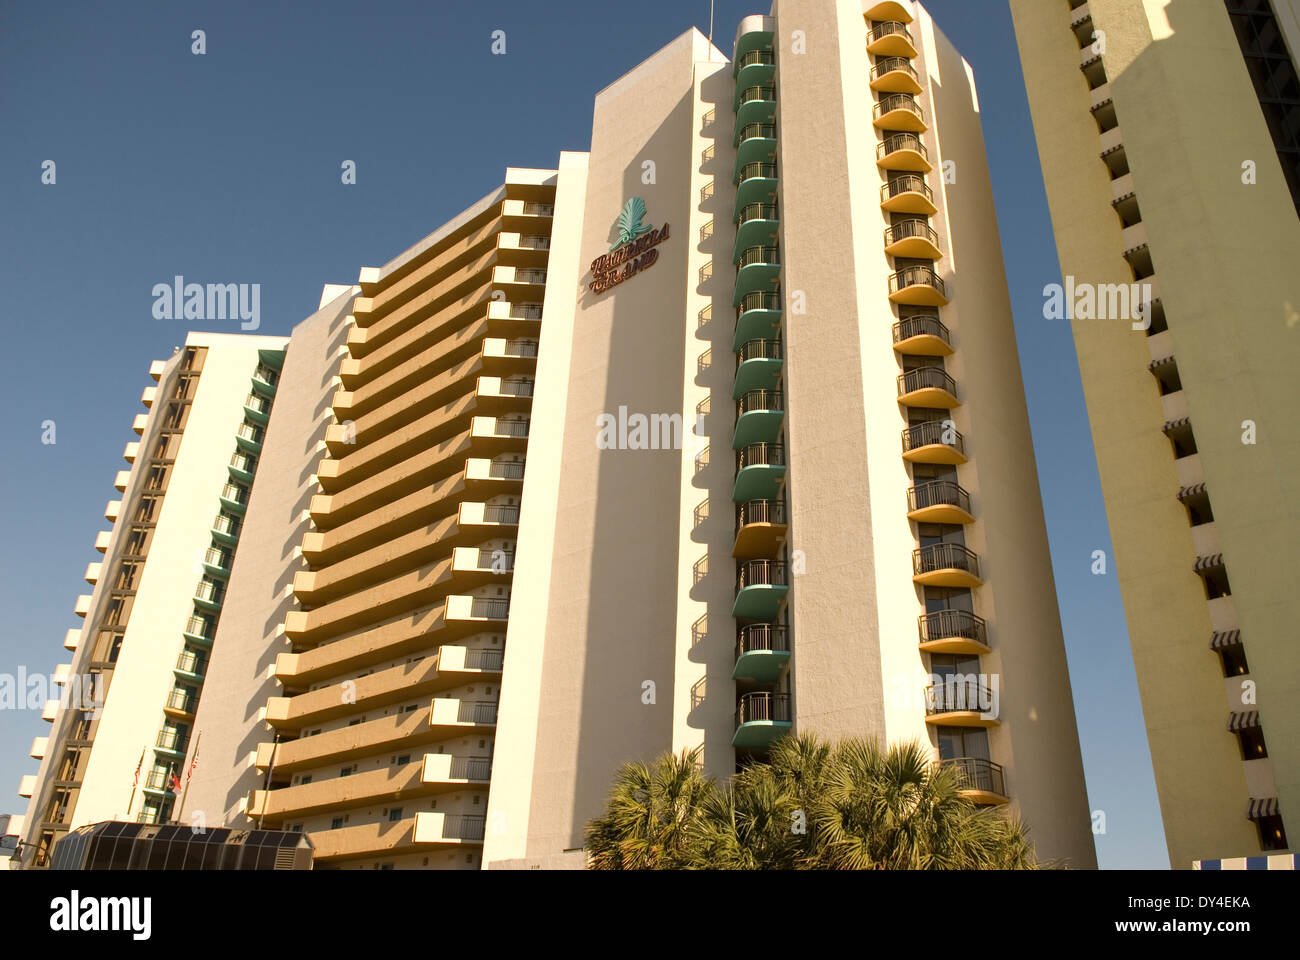 Patricia Grand Hotel Myrtle Beach Sc Usa Stock Photo Alamy